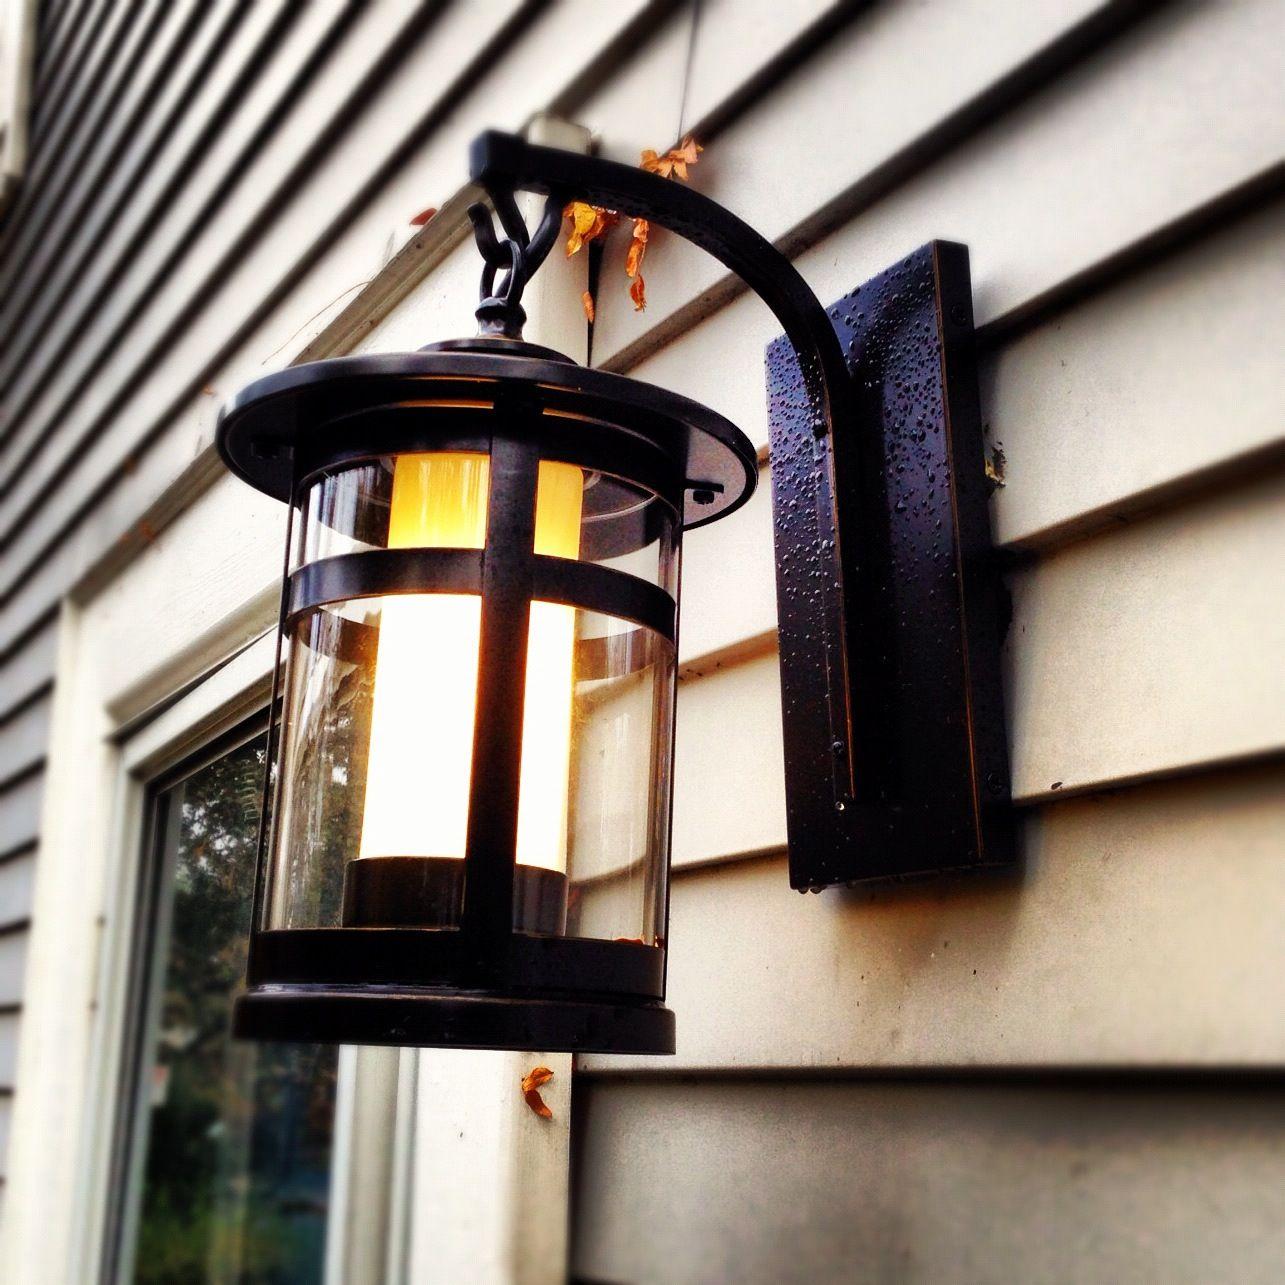 Restoration Hardware Outdoor Lighting Reviews: Restoration Hardware Rutherford Sconce